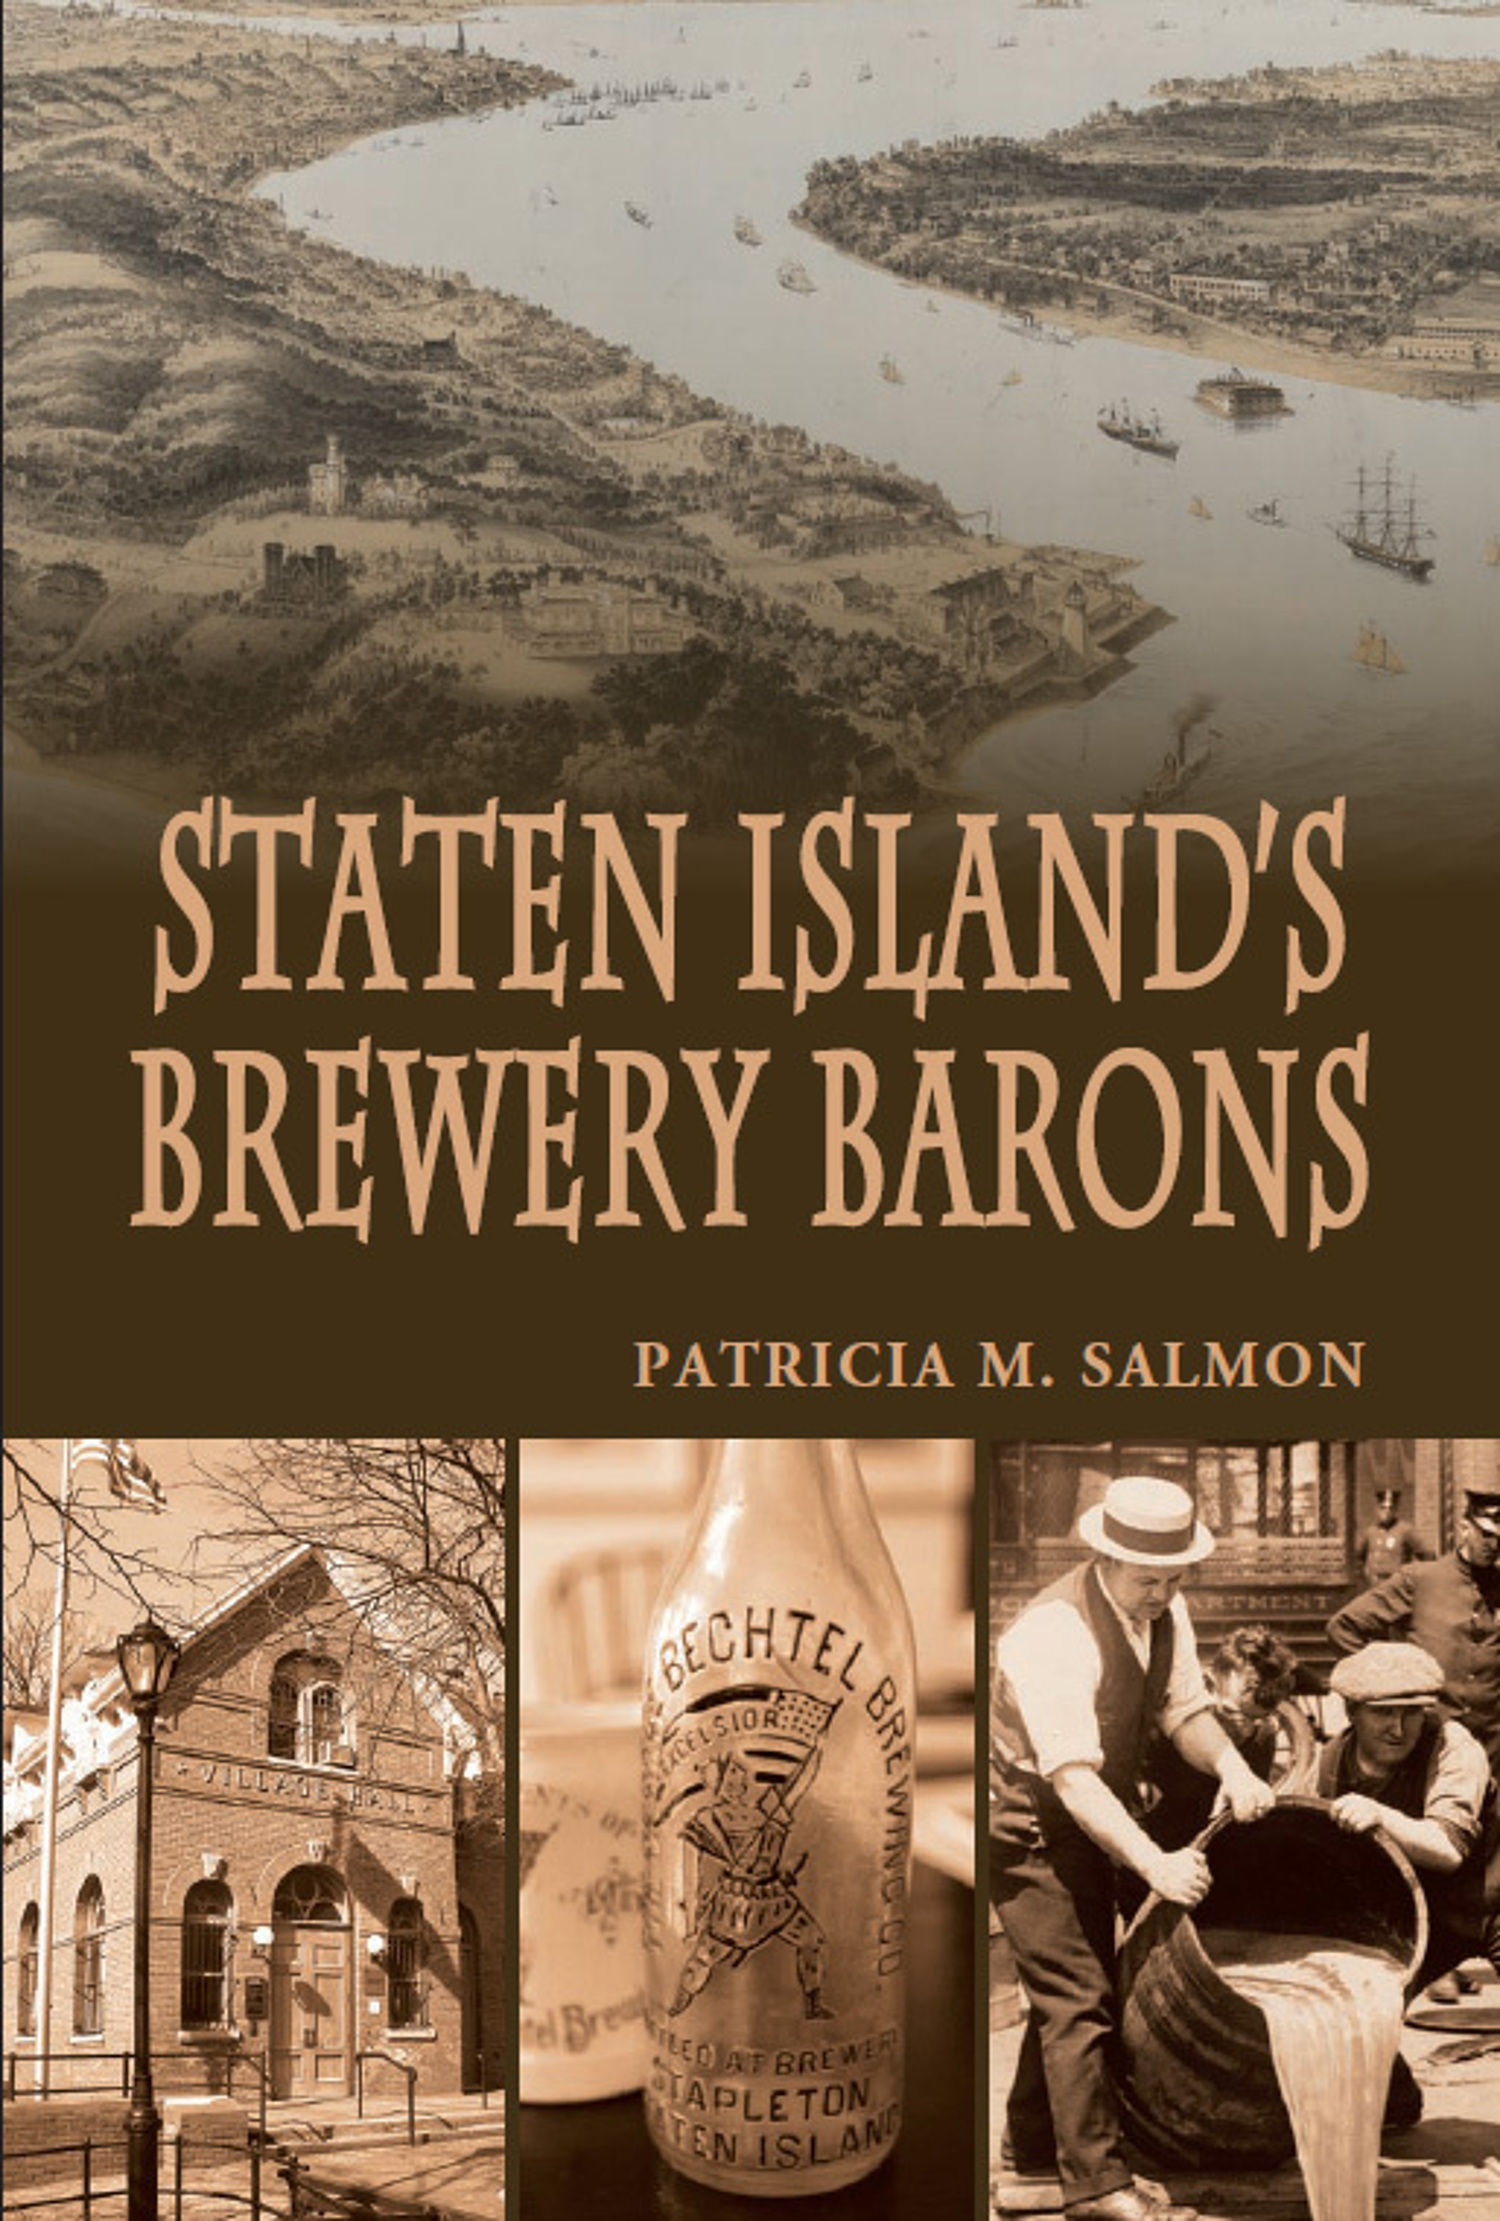 Staten Island's Brewery Barons, Patricia M. Salmon